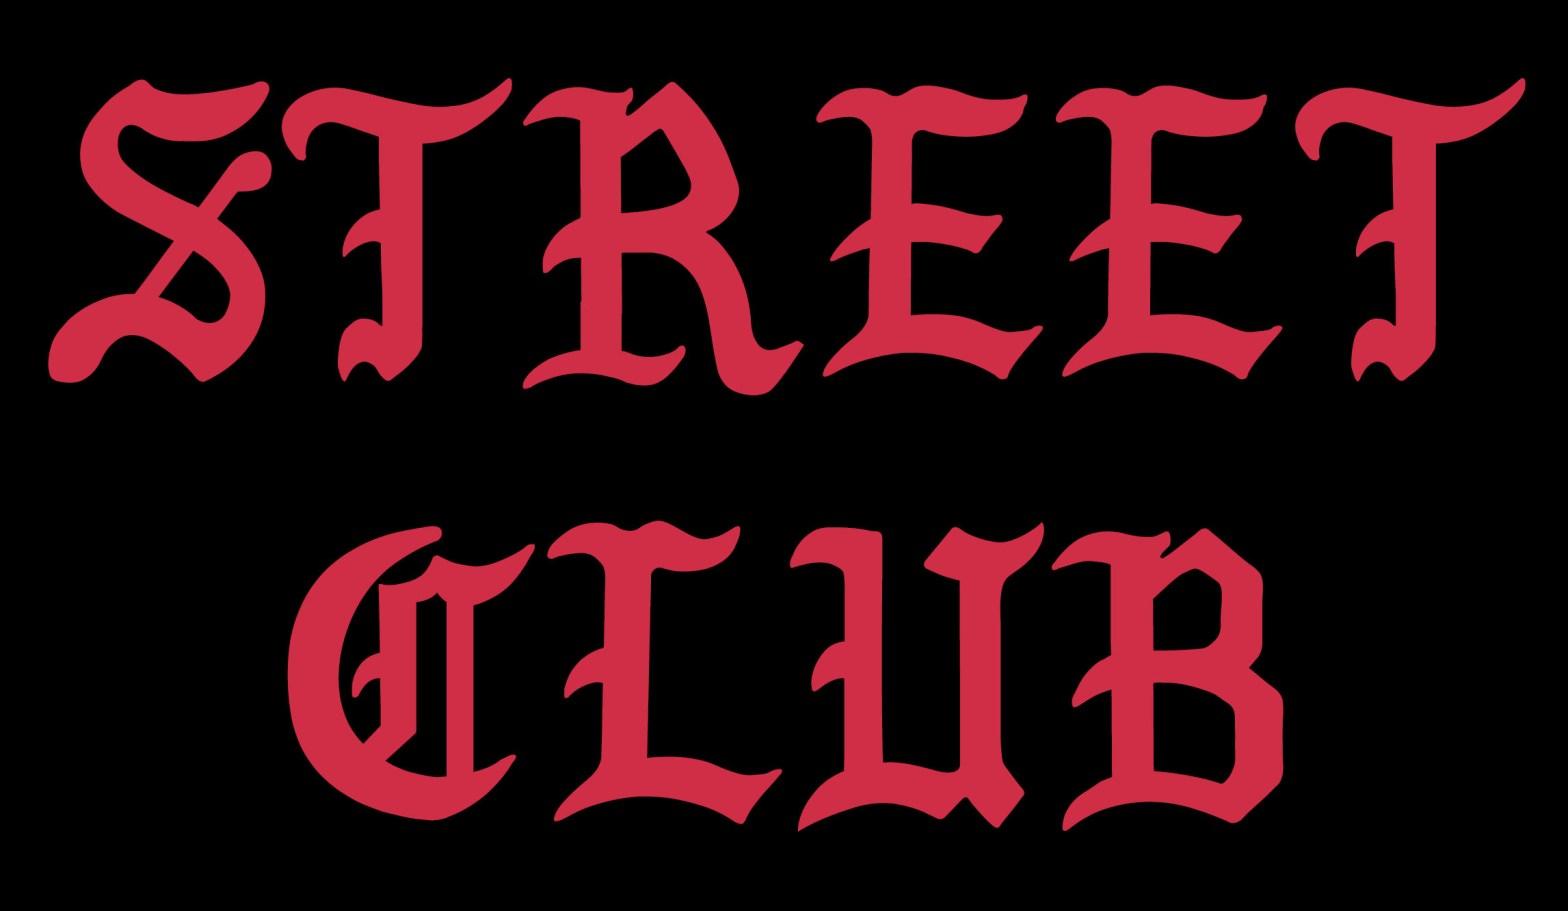 STREET CLUB